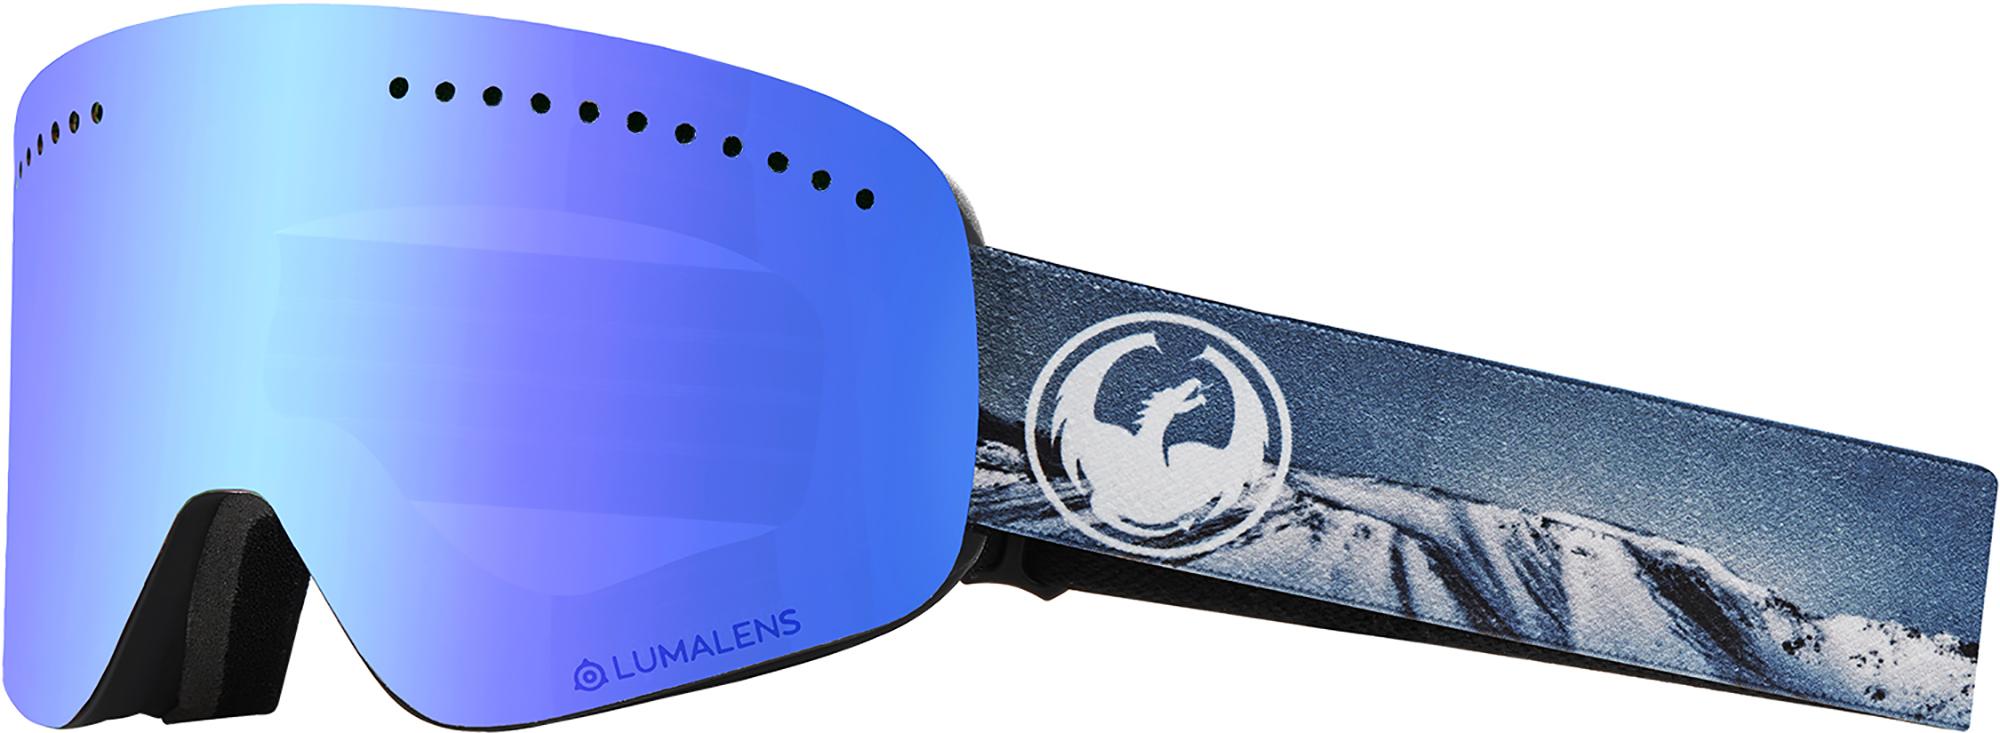 Dragon Маска со сменной линзой Dragon NFX маска для сноуборда dragon nfxs plot pink ion yellow